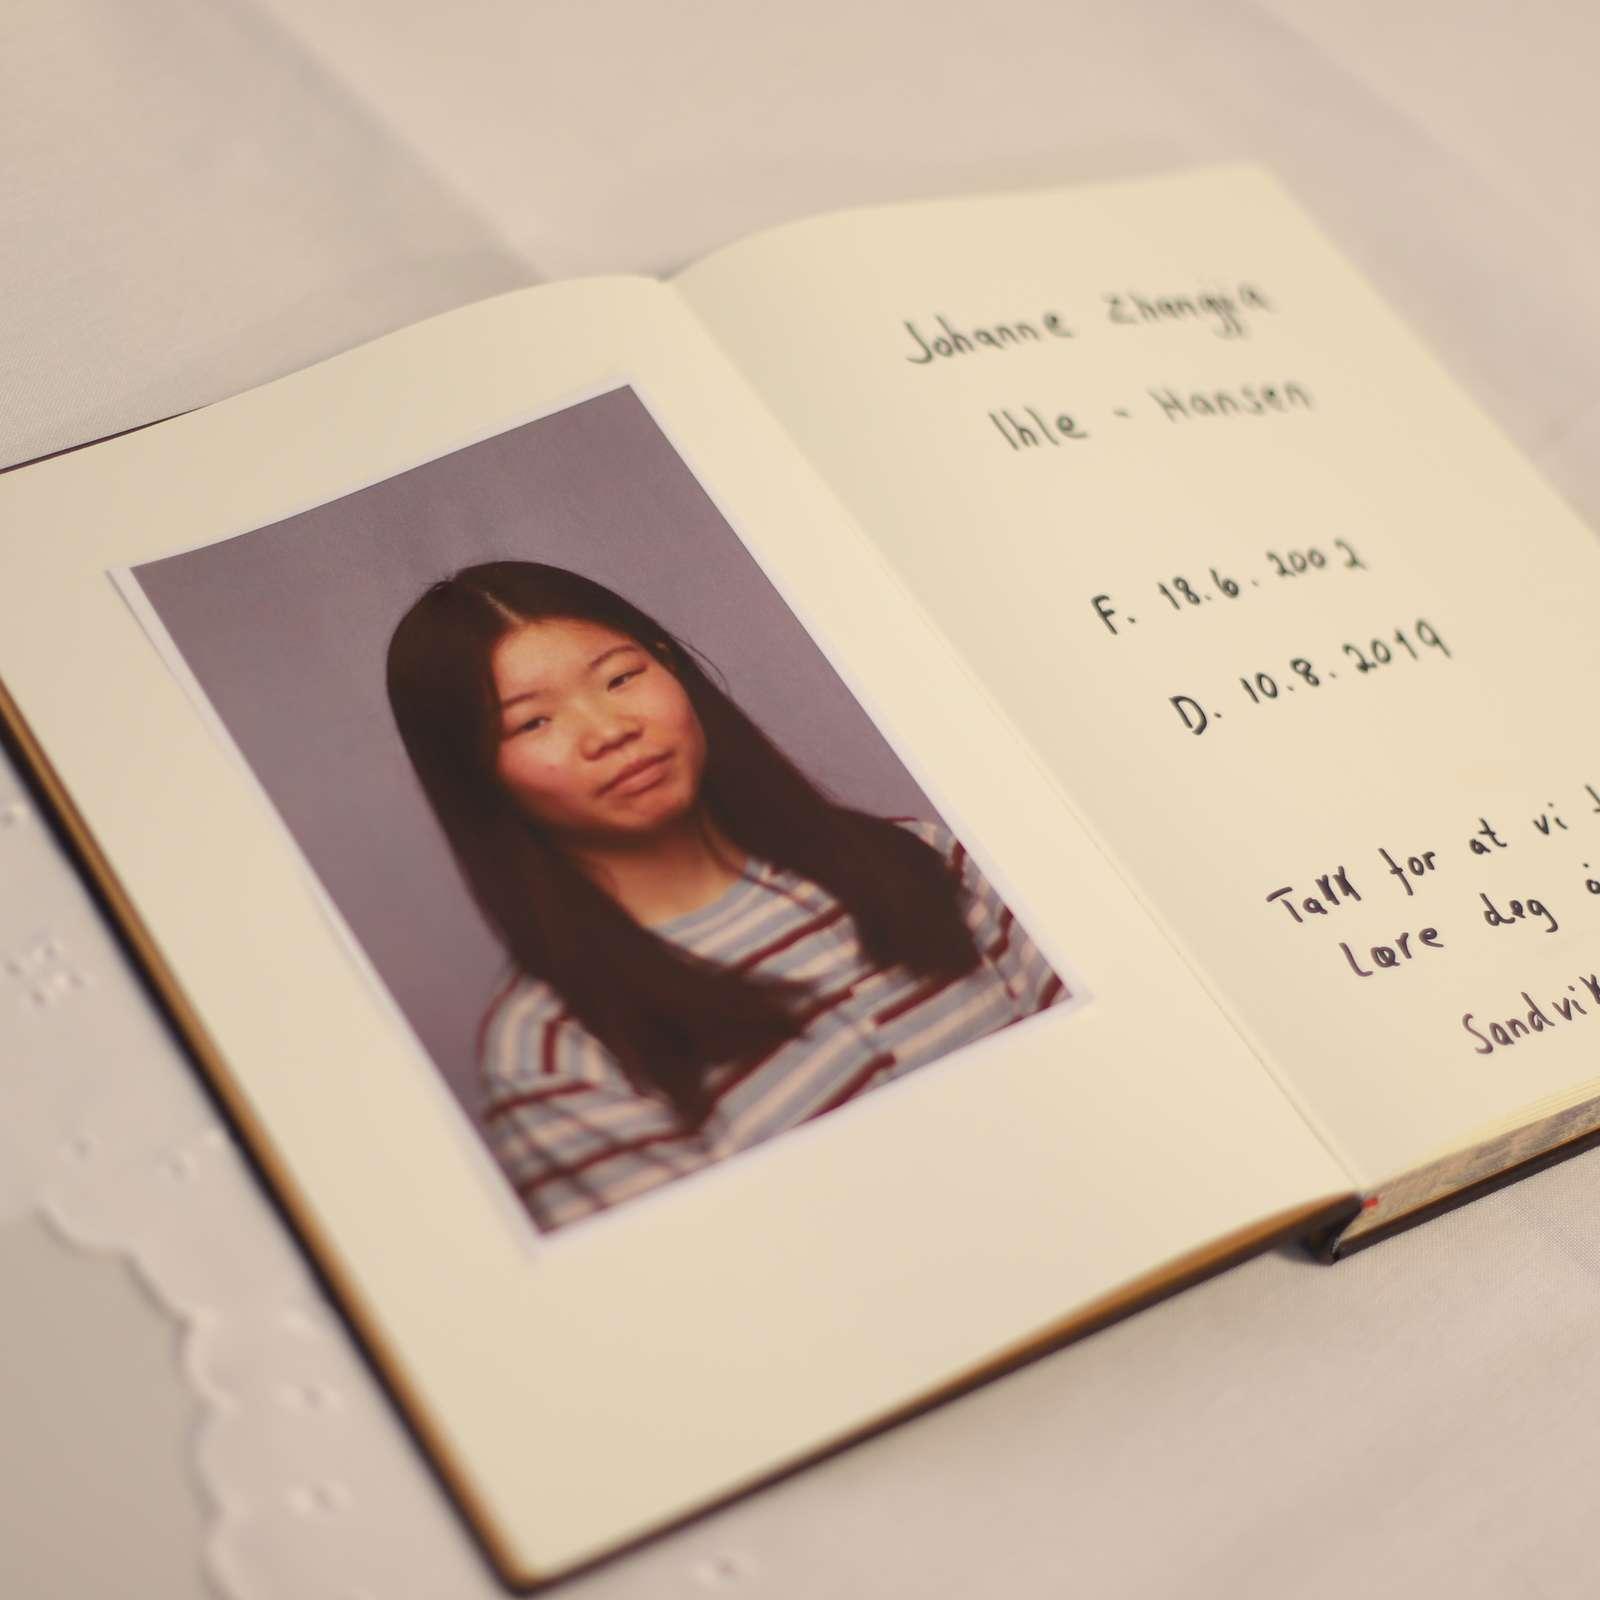 Minneprotokoll for Johanne Zhangjia Ihle-Hansen